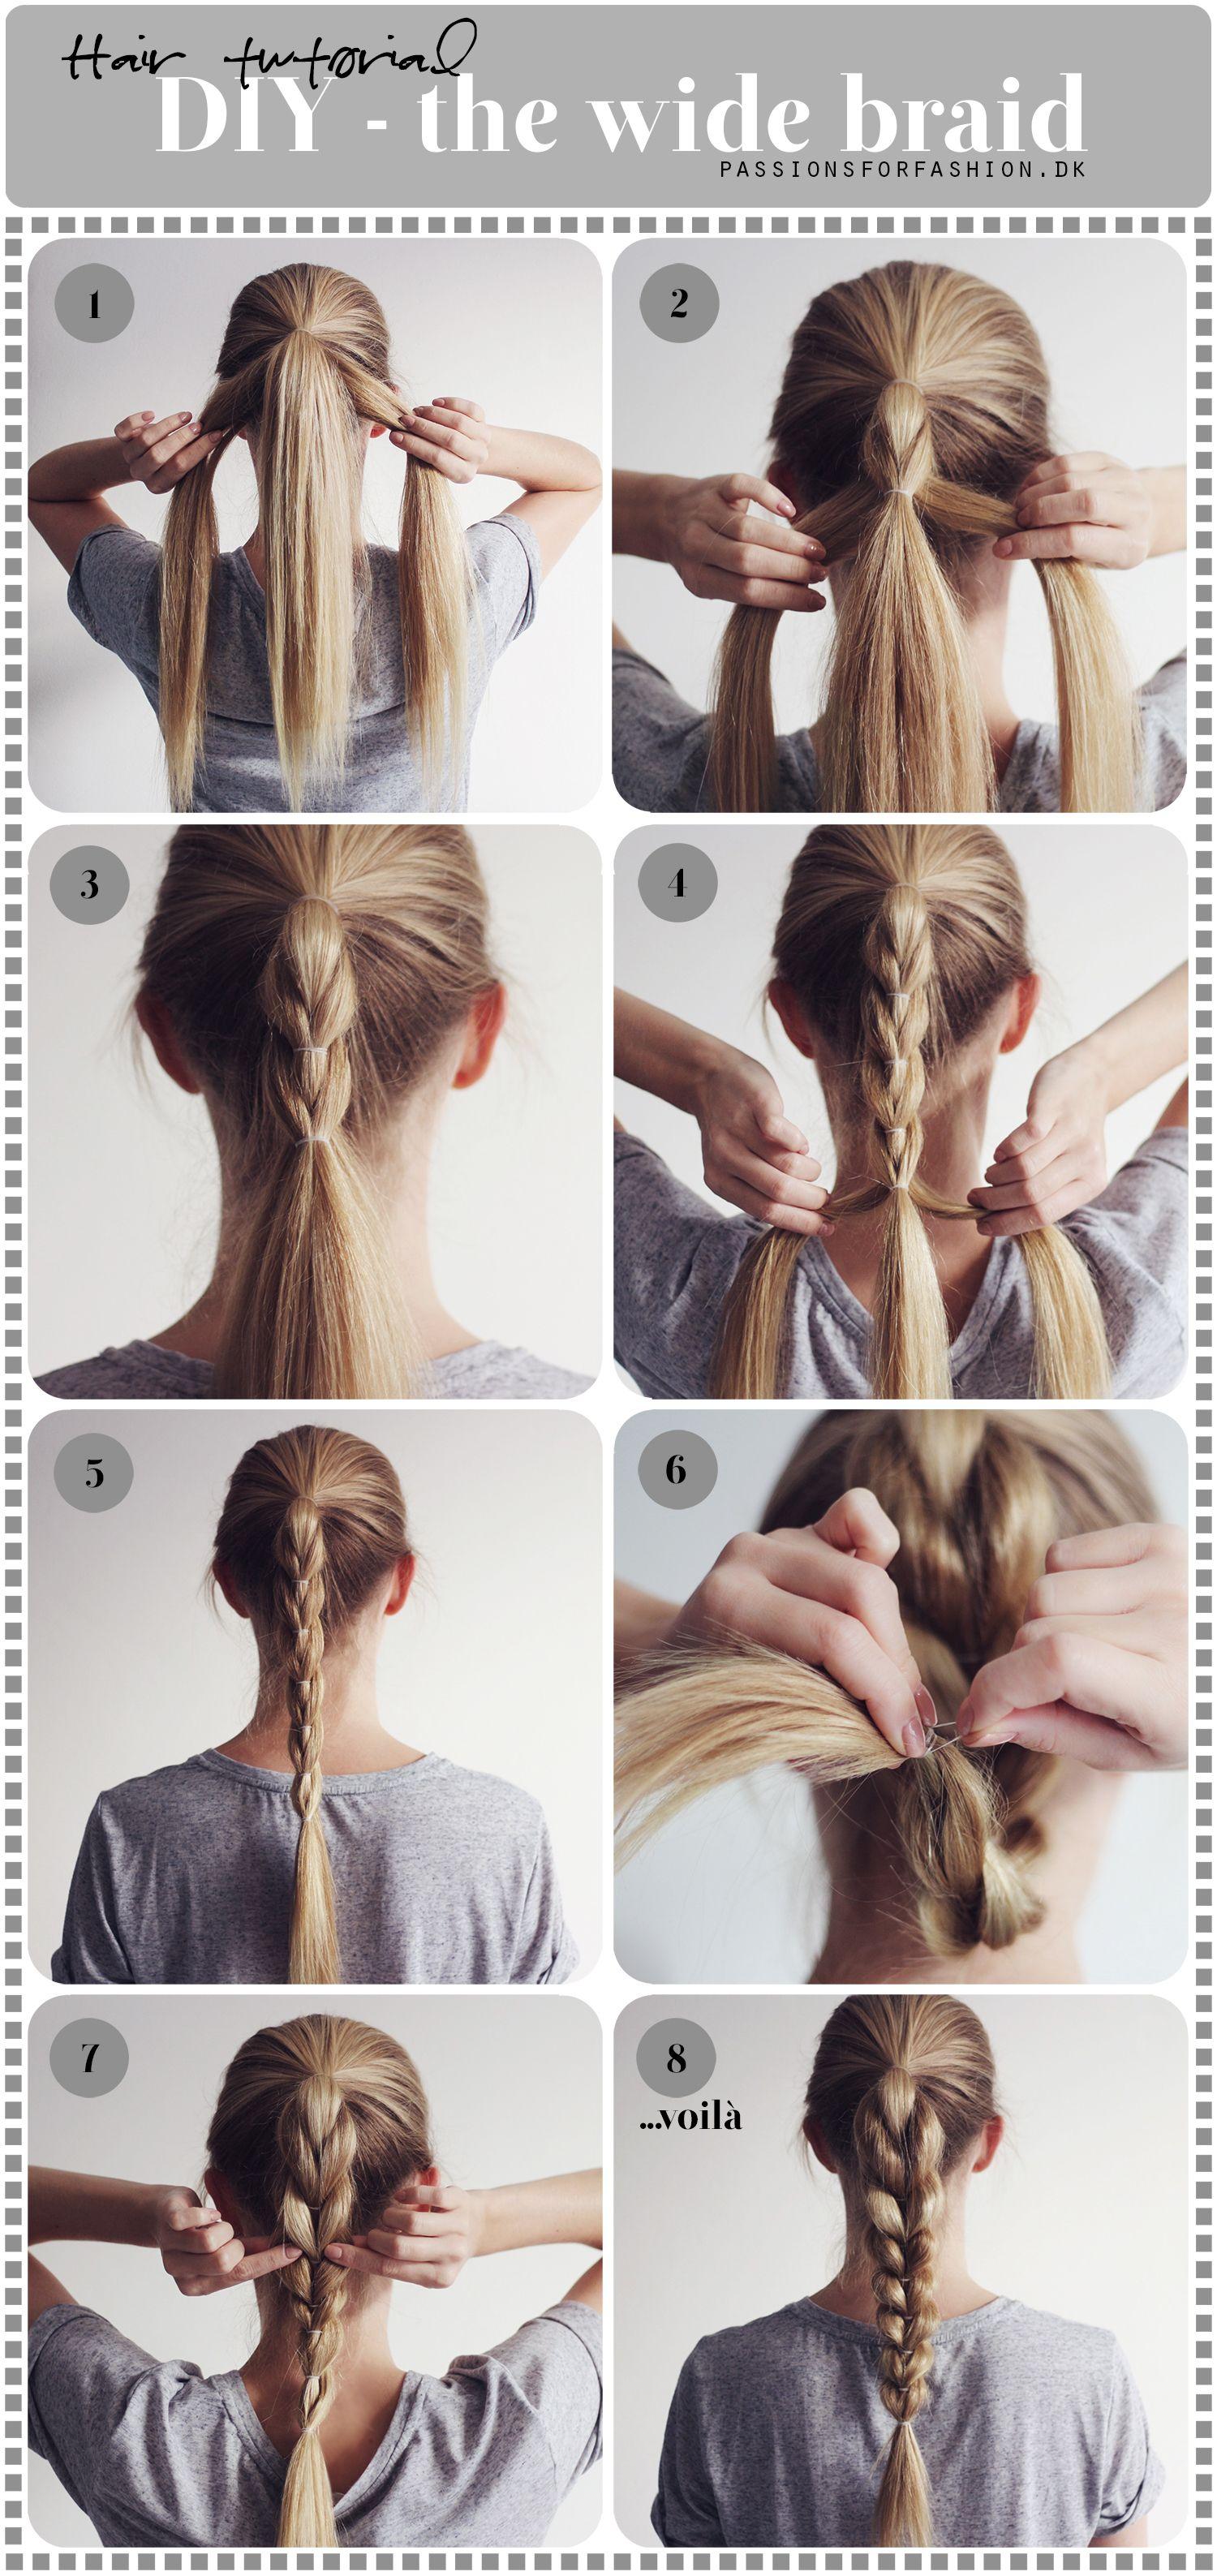 Pin by katharina zietlow on frisuren pinterest hair style easy